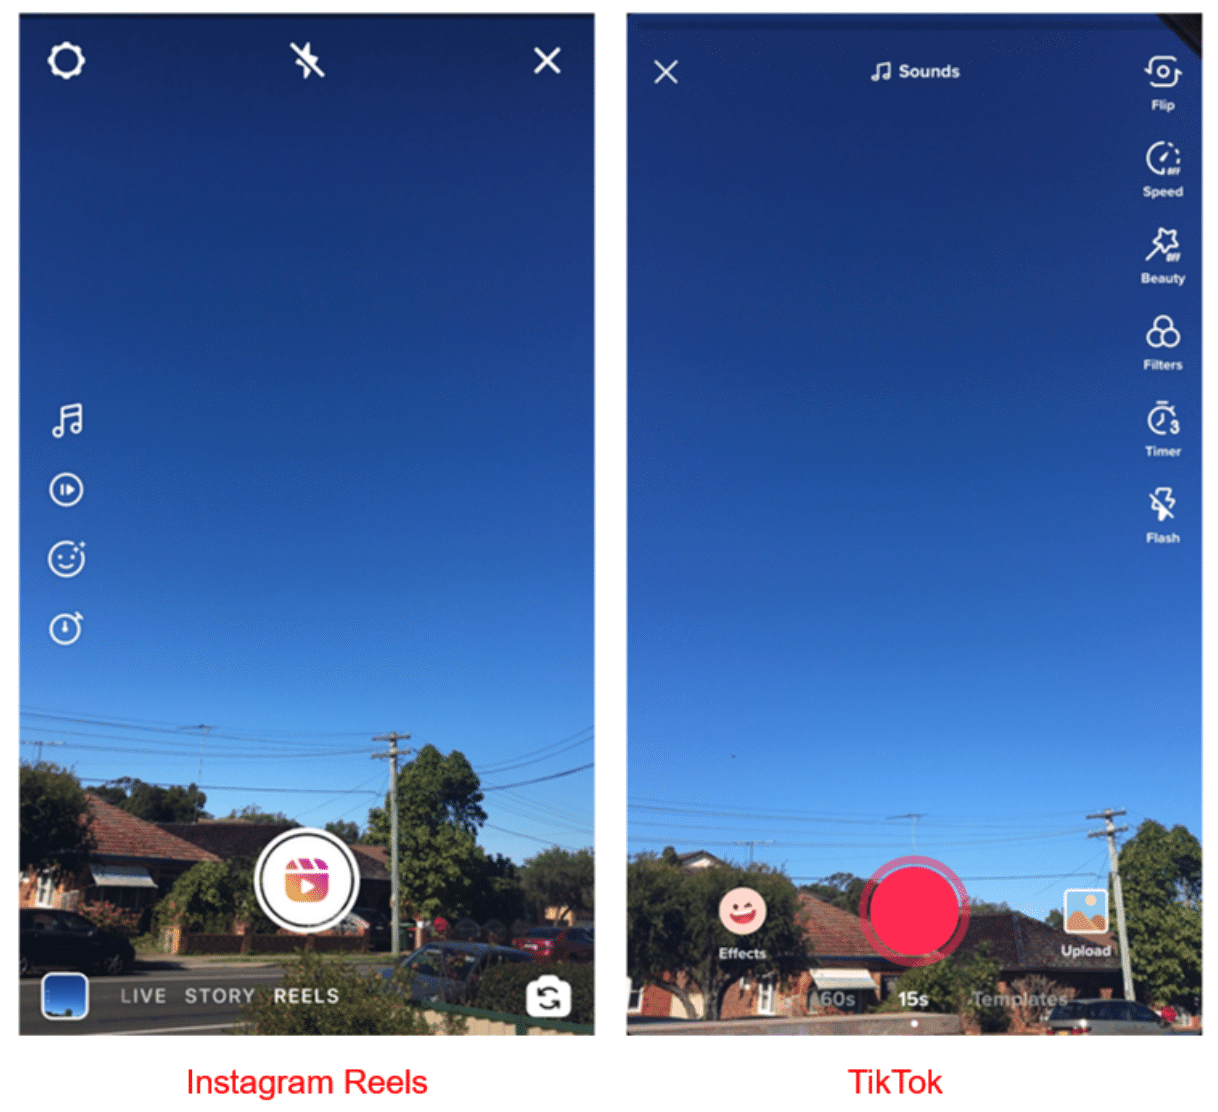 Сравнение Instagram Reels и TikTok